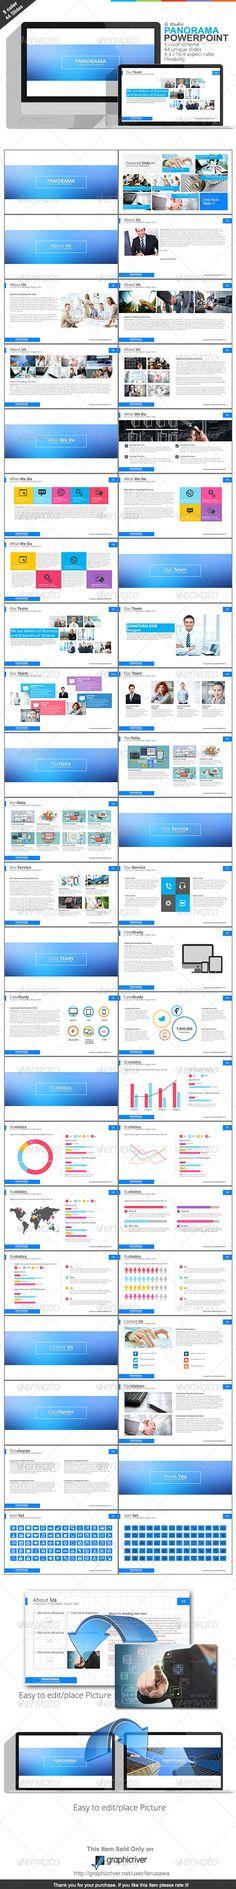 Gstudio Panorama Powerpoint Template - Business Powerpoint Templates